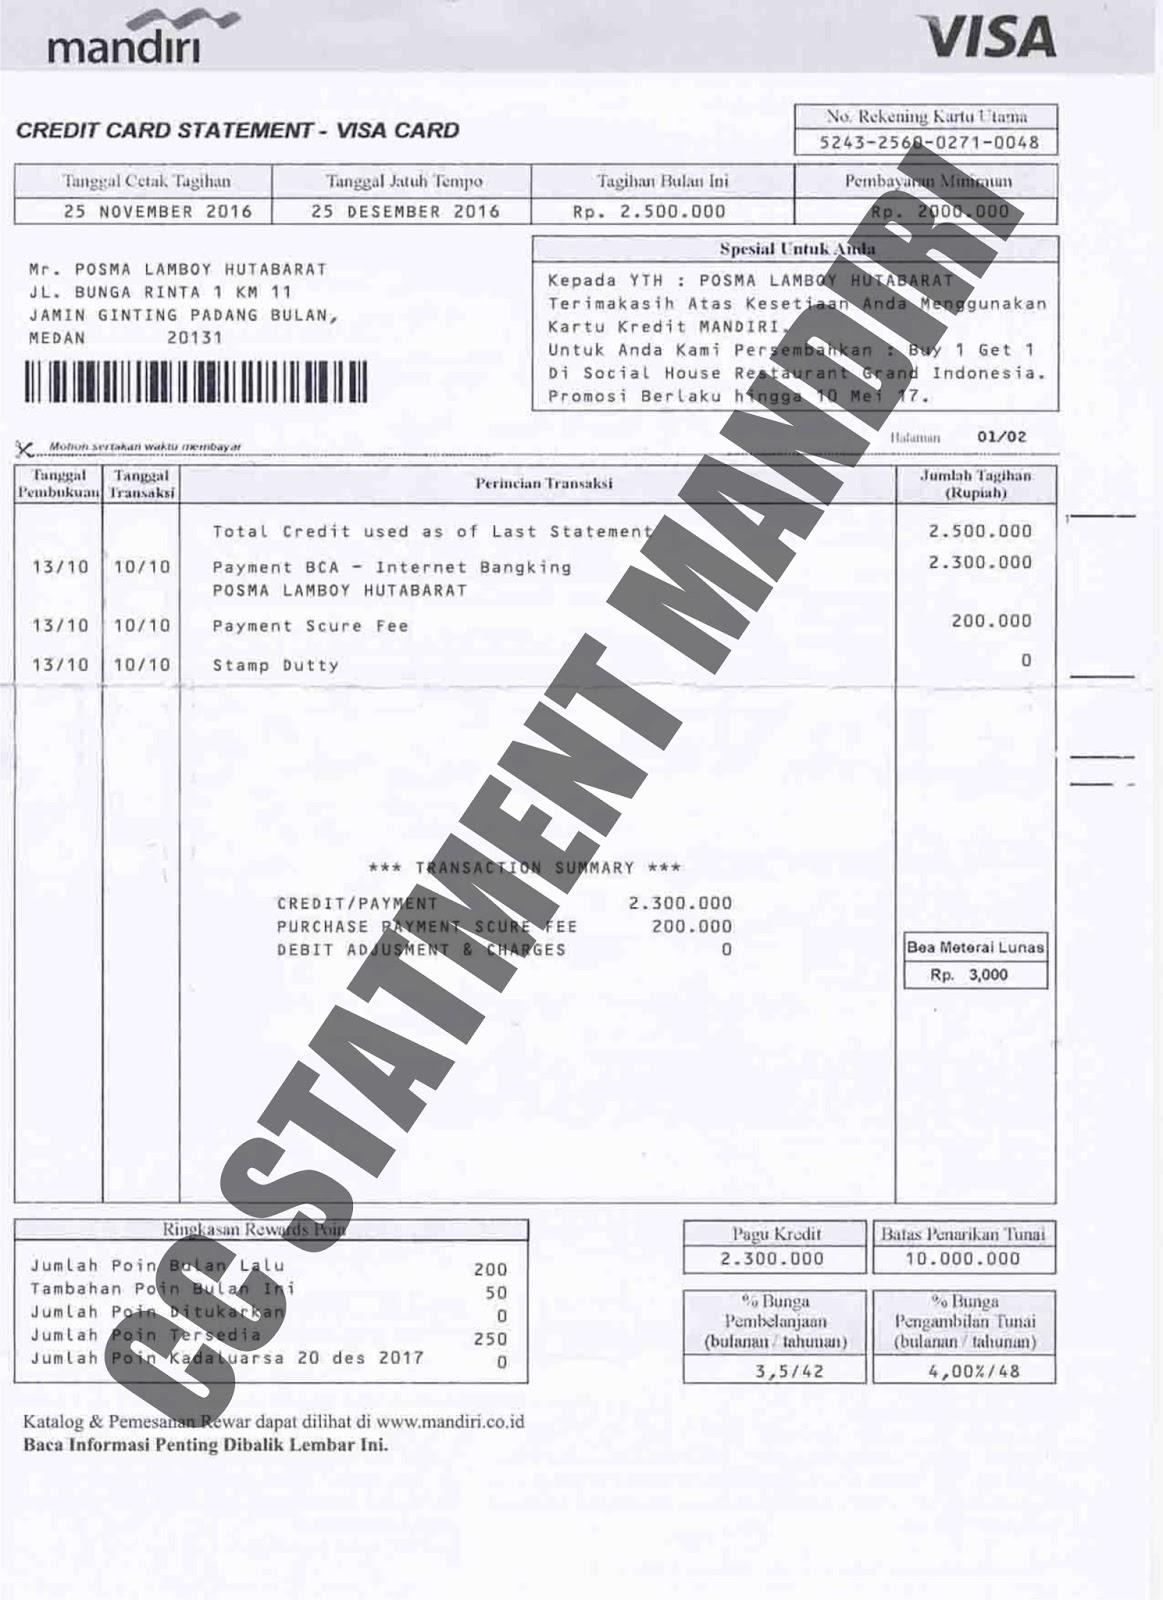 Jasa Pembuatan Dokumen Paypal Untuk V C Verifikasi Garansi Sampai Bisa Akun Verified